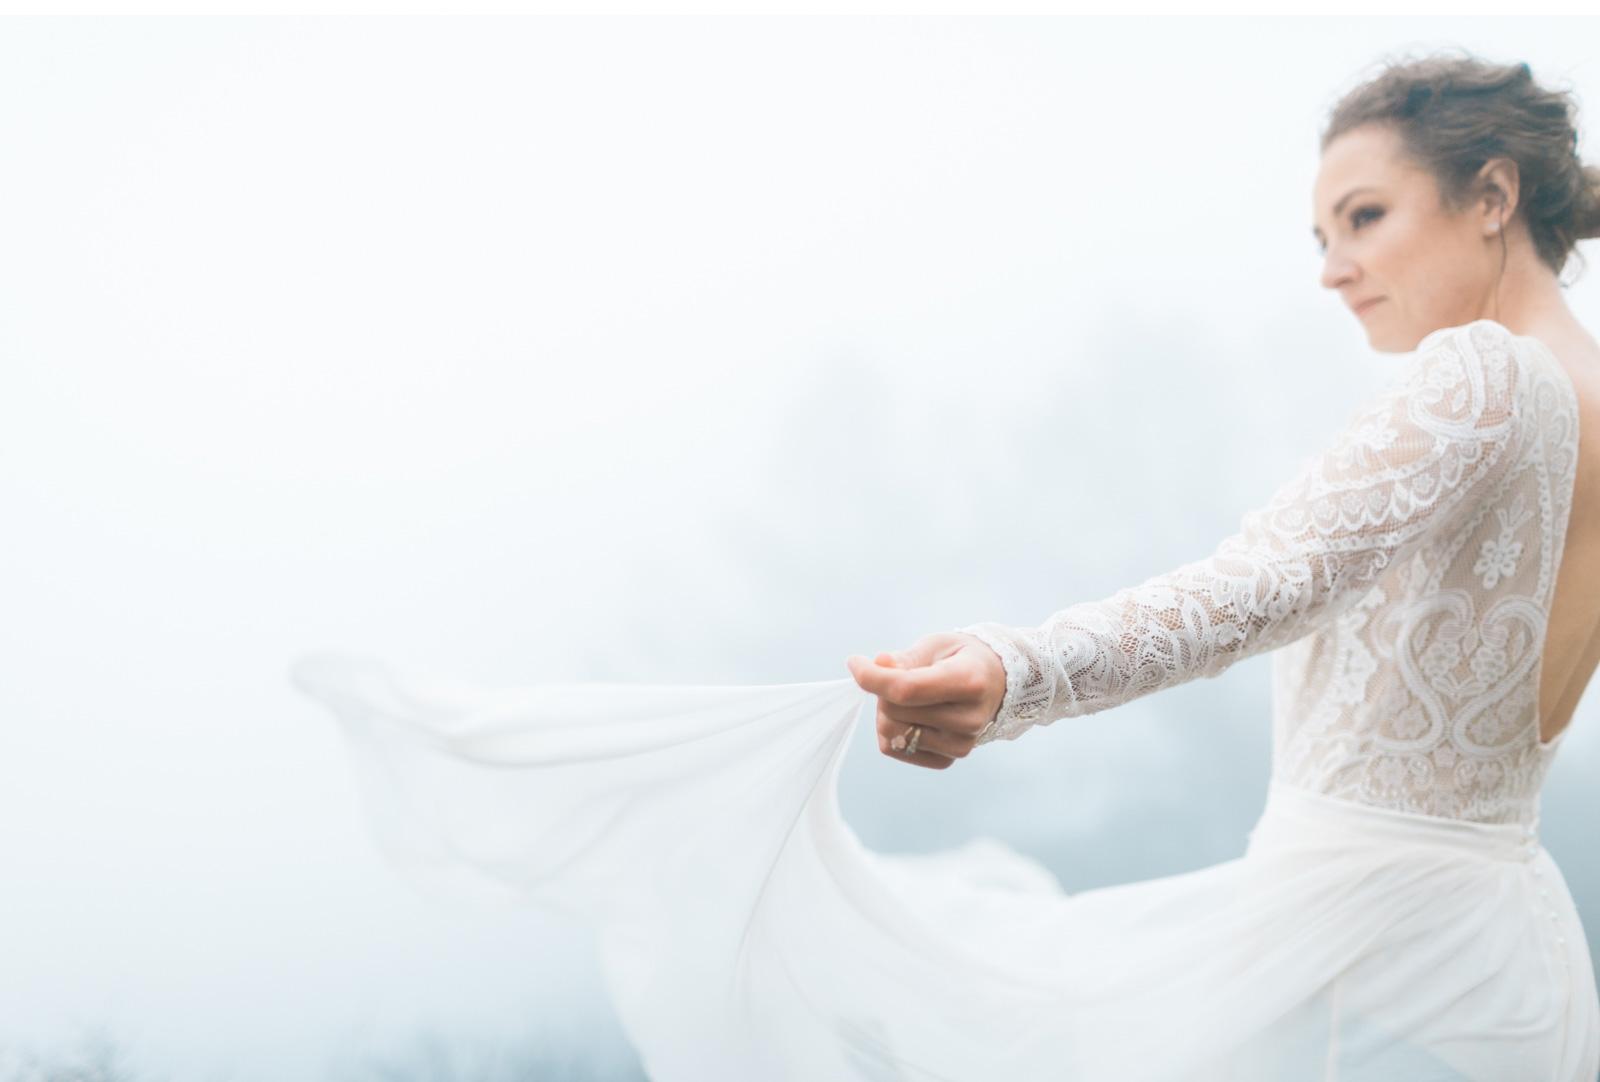 Knapps-Castle-Wedding-Natalie-Schutt-Photography_10.jpg